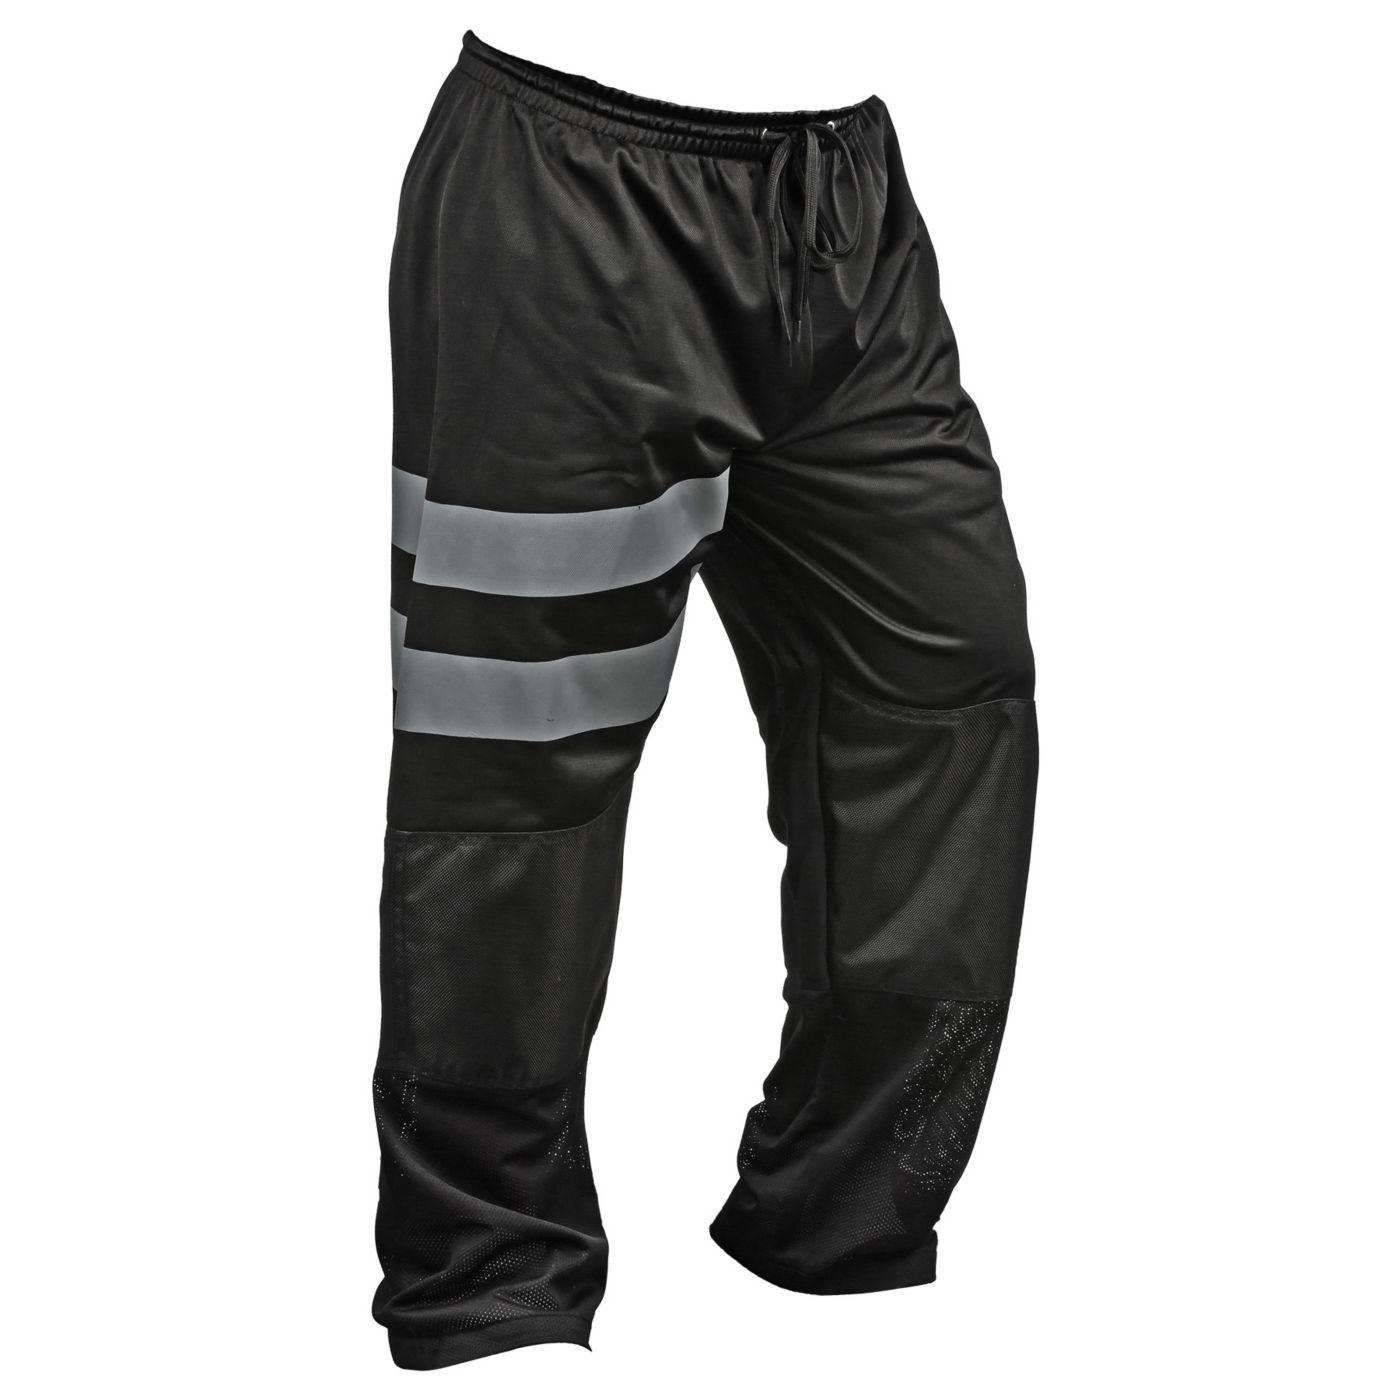 TOUR Youth Spartan XT Roller Hockey Pants